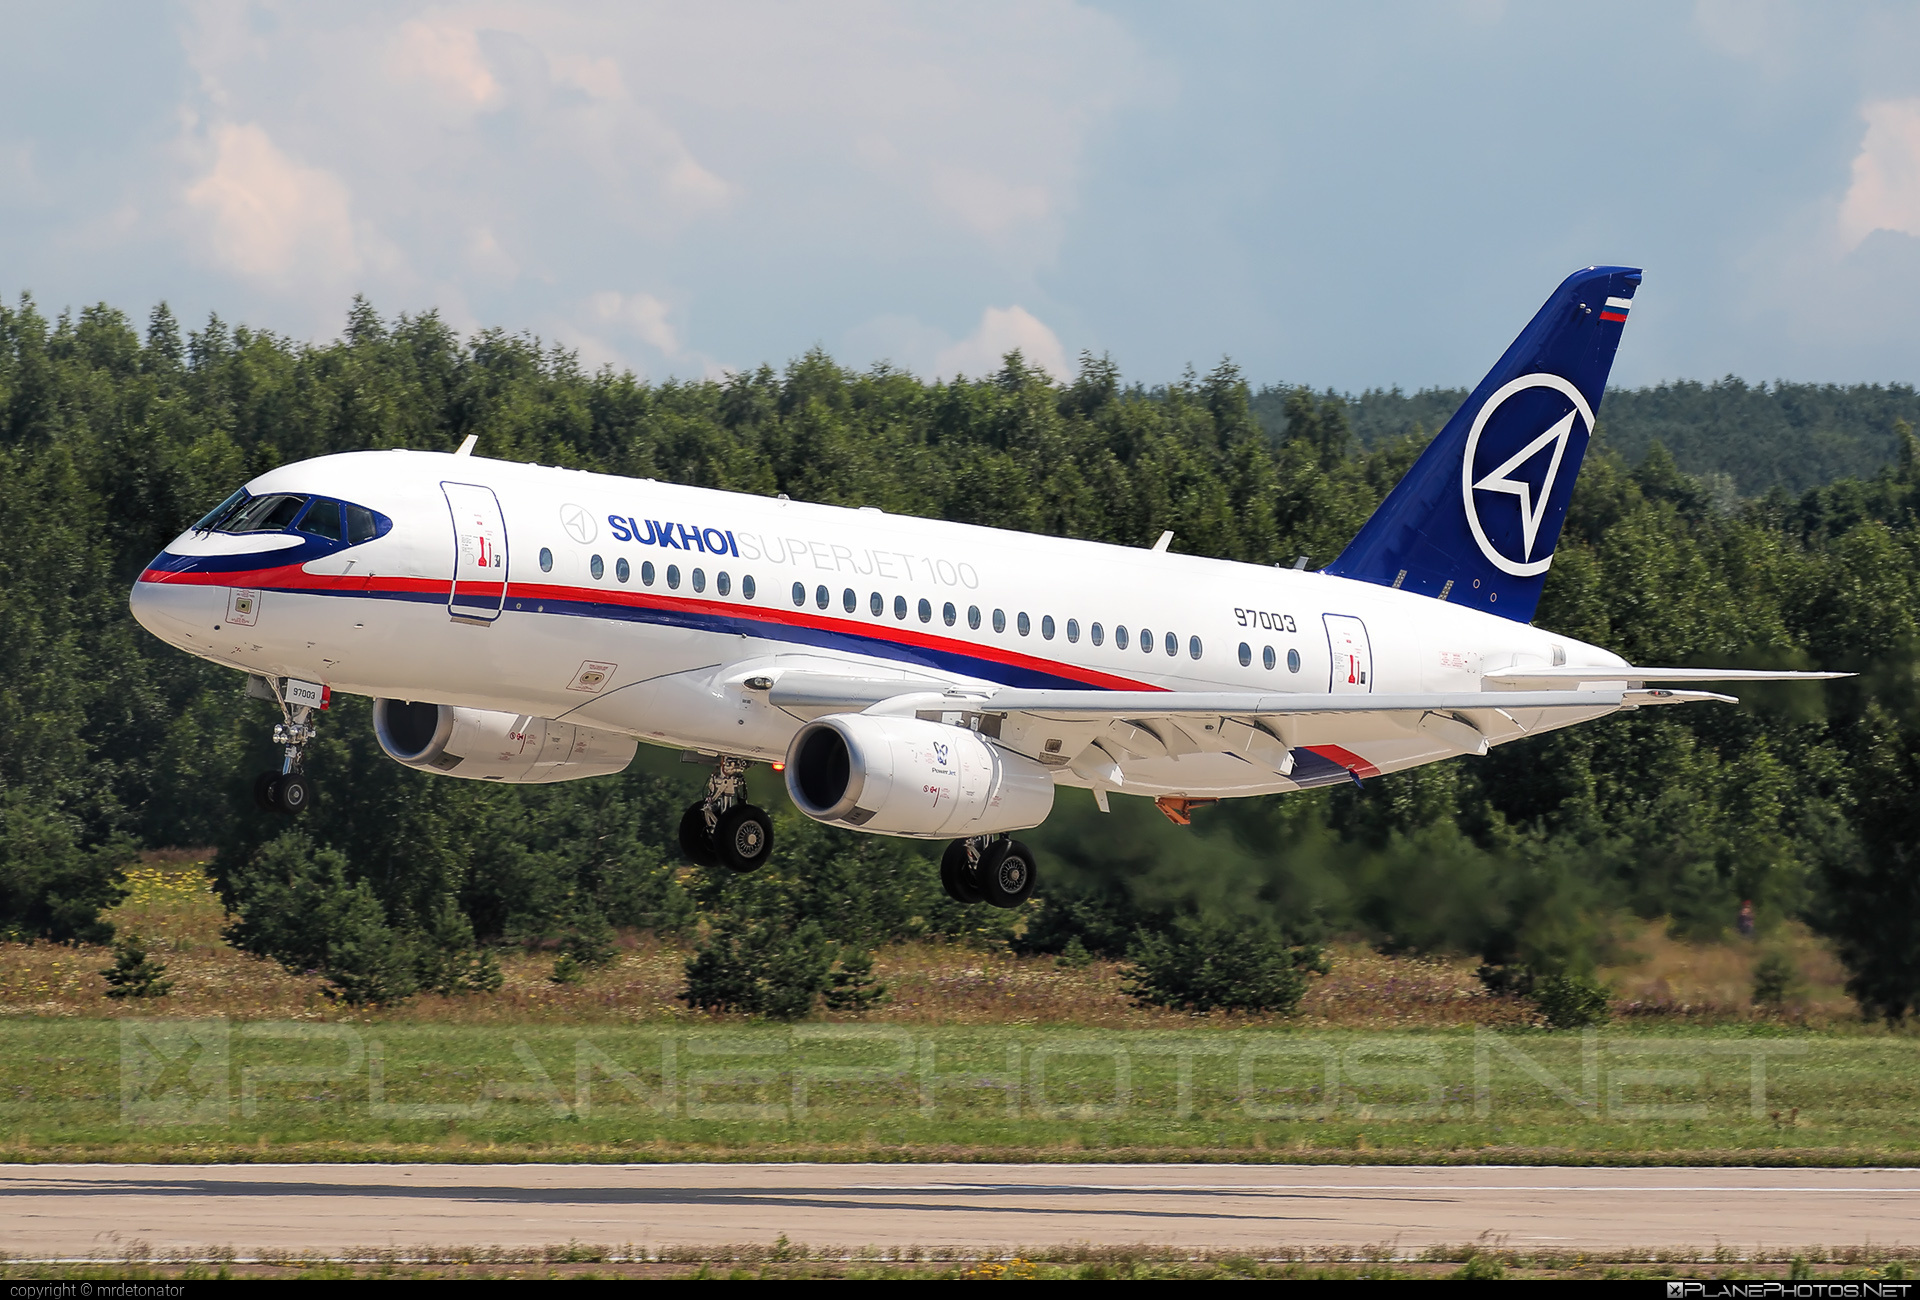 Sukhoi SSJ 100-95B Superjet - 97003 operated by Sukhoi Design Bureau #maks2017 #ssj100 #ssj10095b #sukhoi #sukhoisuperjet #superjet